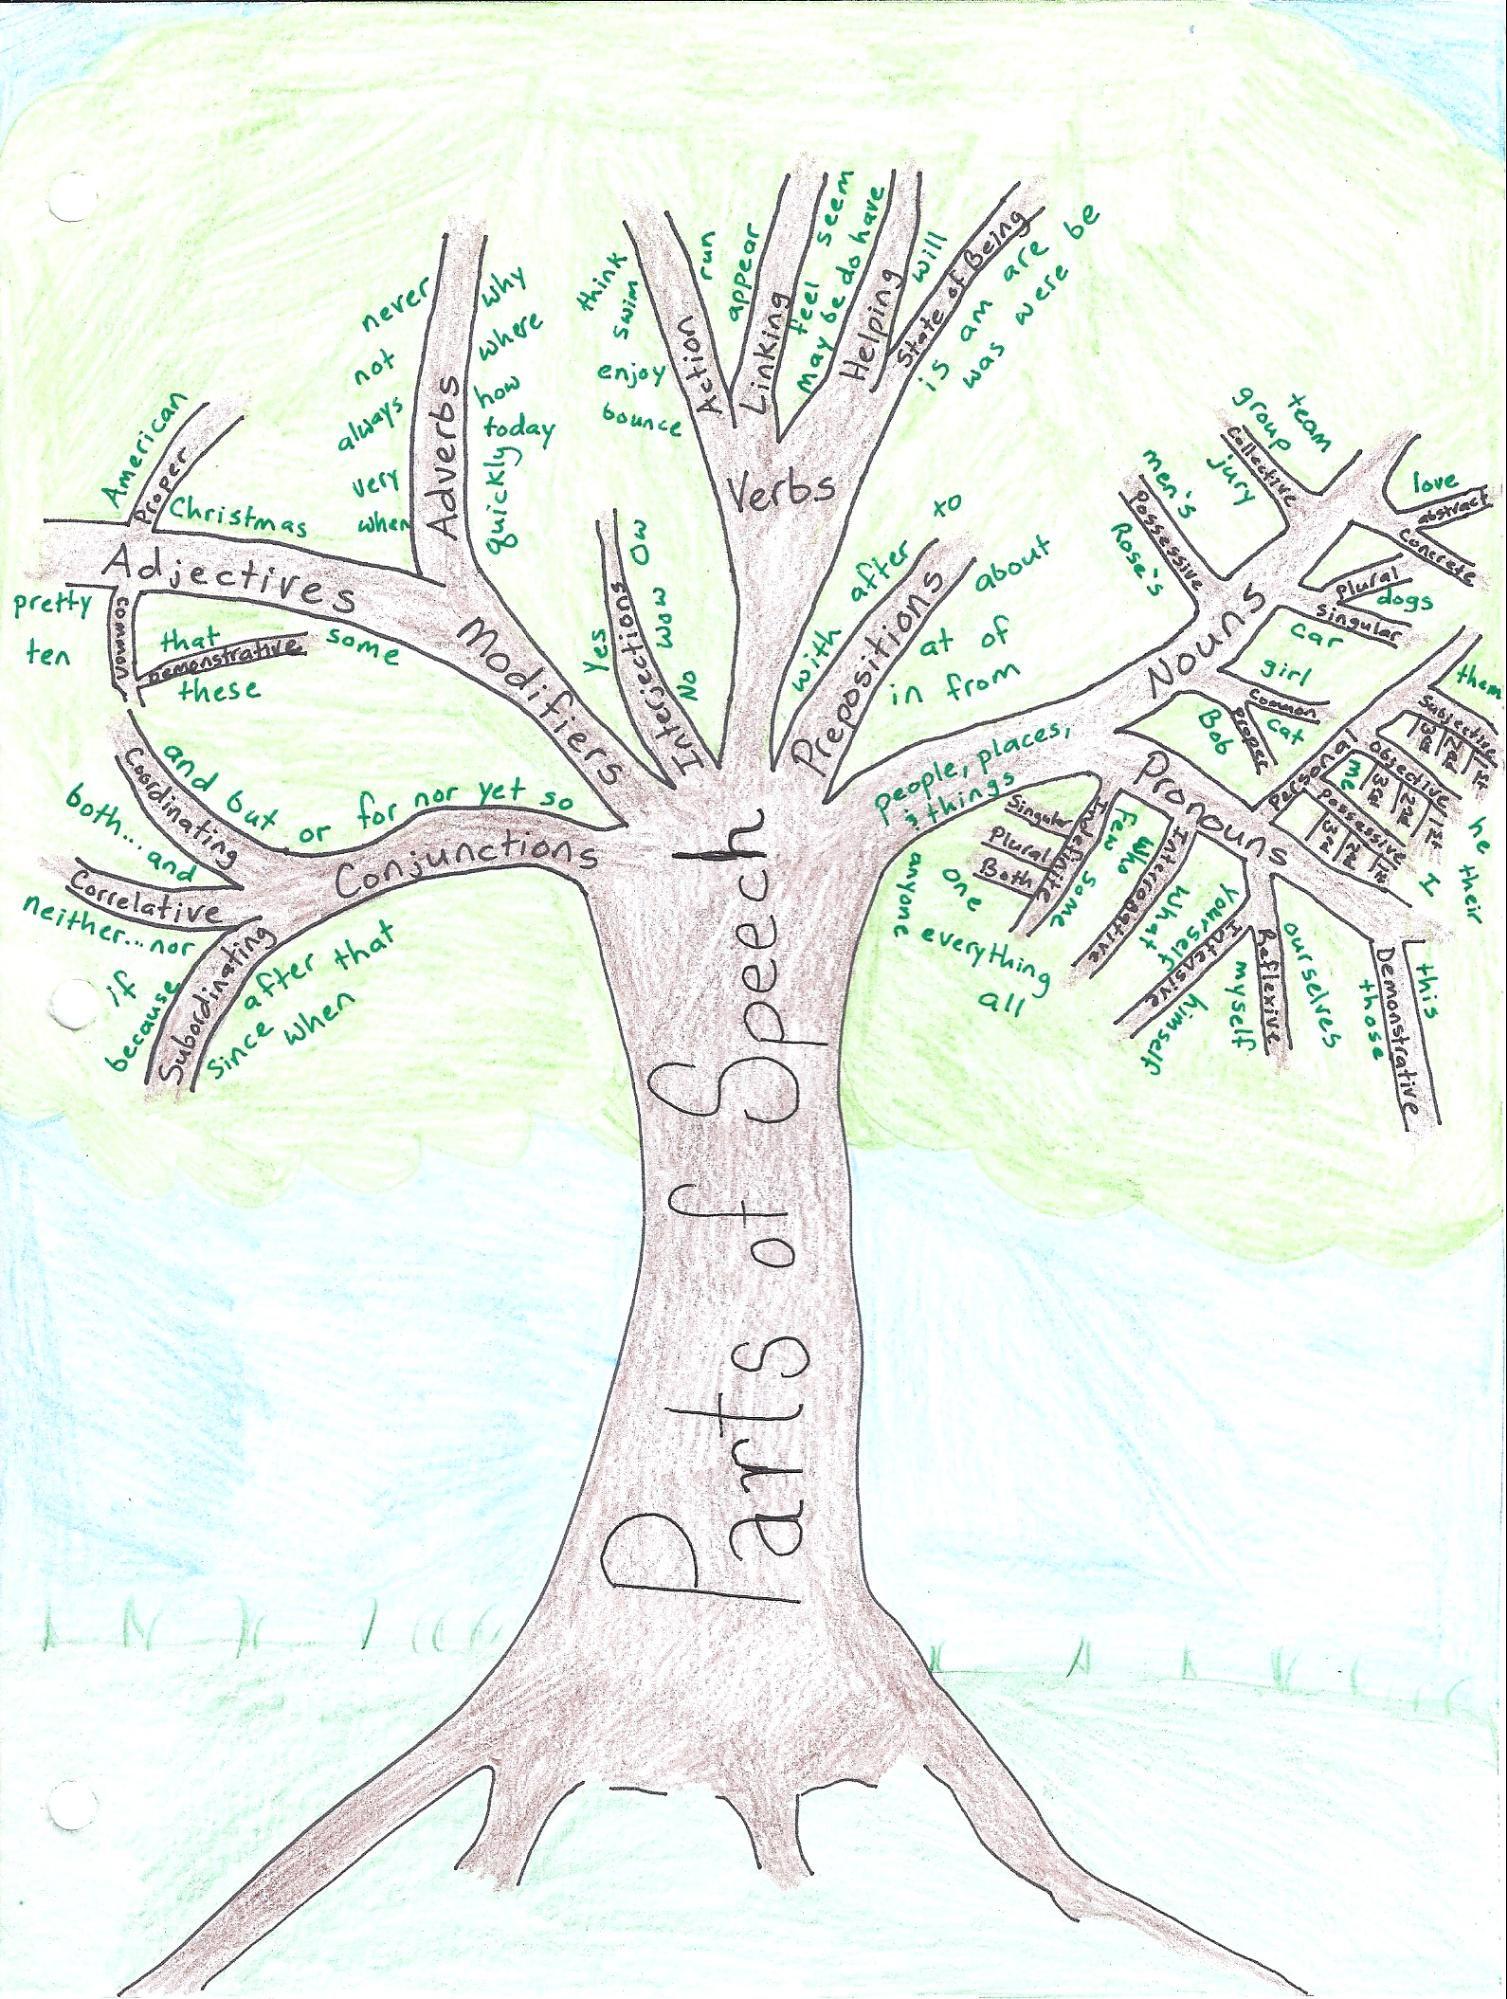 teaching tree diagram vl wiring stereo week 1 english grammar parts of speech cool